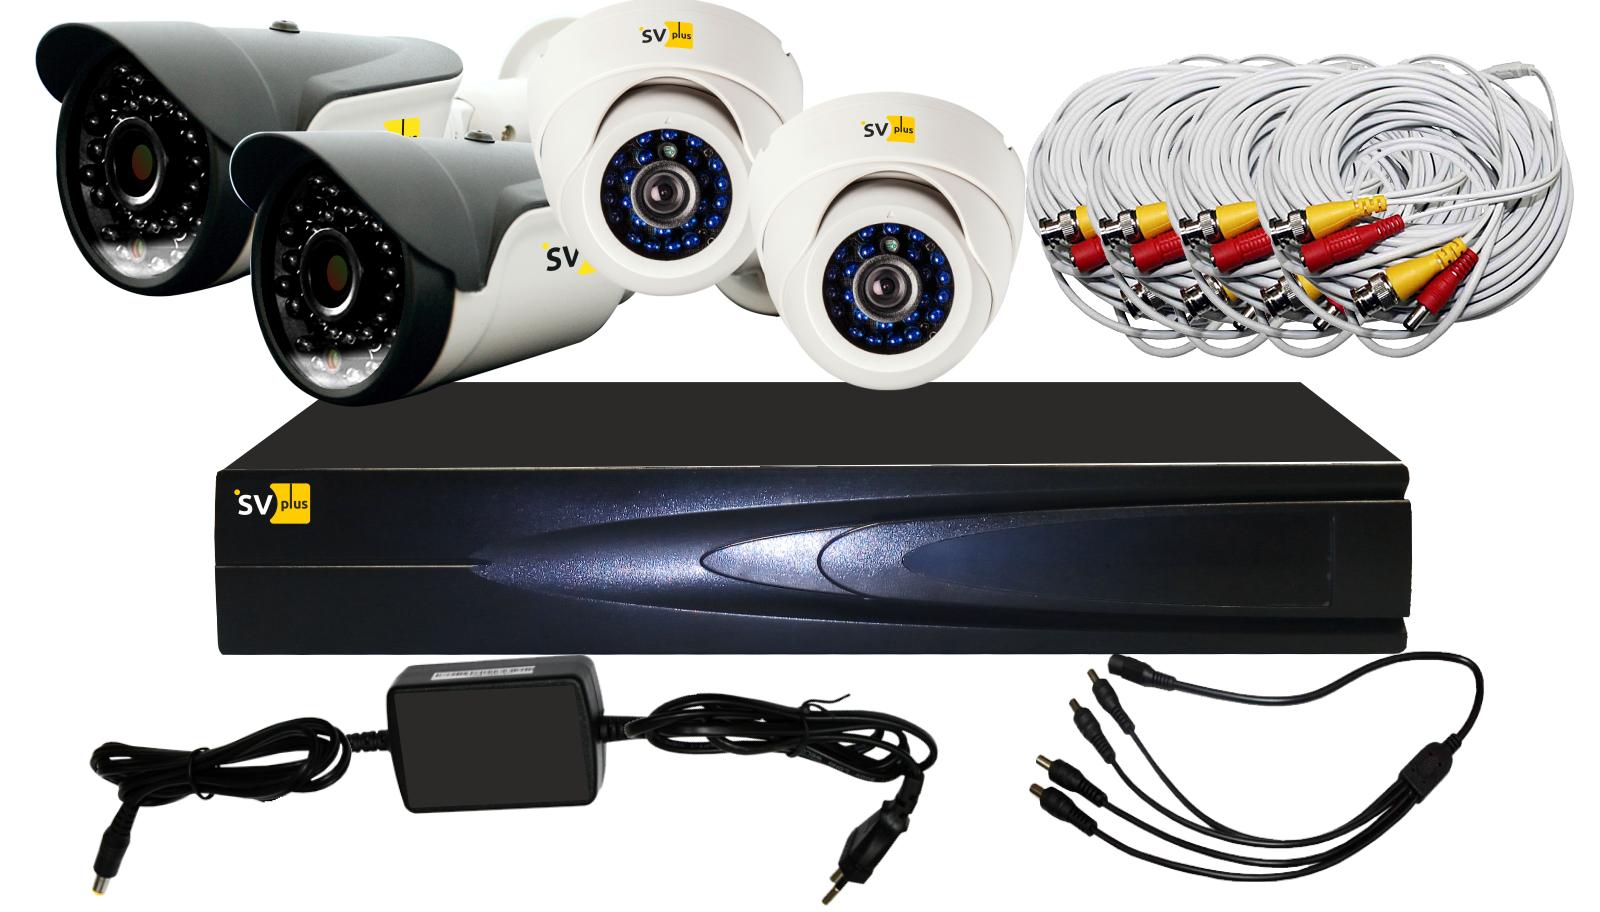 Комплект видеонаблюдения Svplus Vhd-kit114u